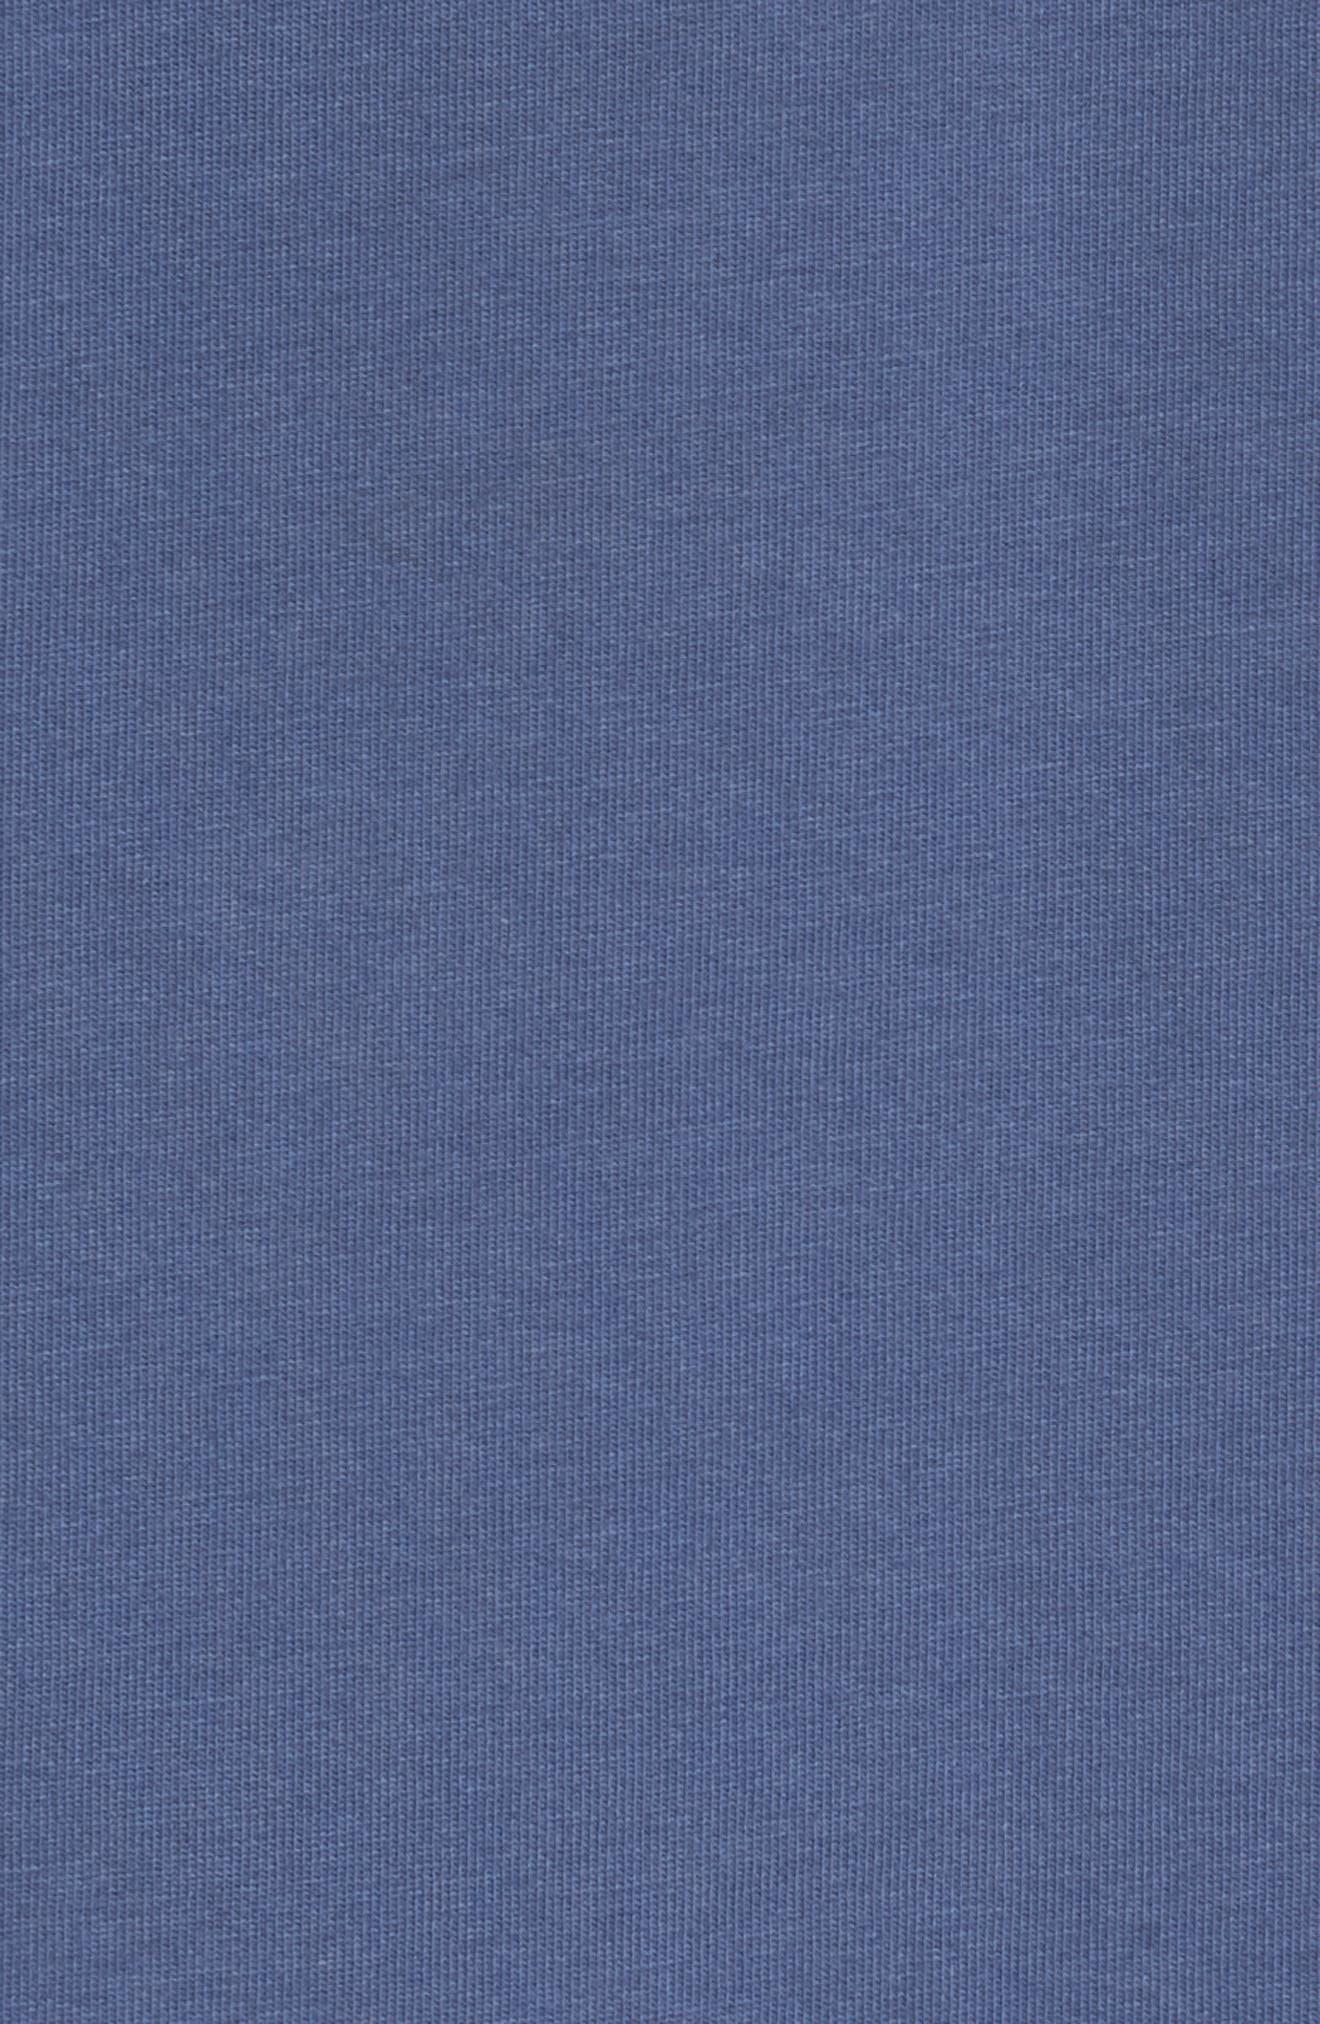 Mahi Long Sleeve T-Shirt,                             Alternate thumbnail 5, color,                             461